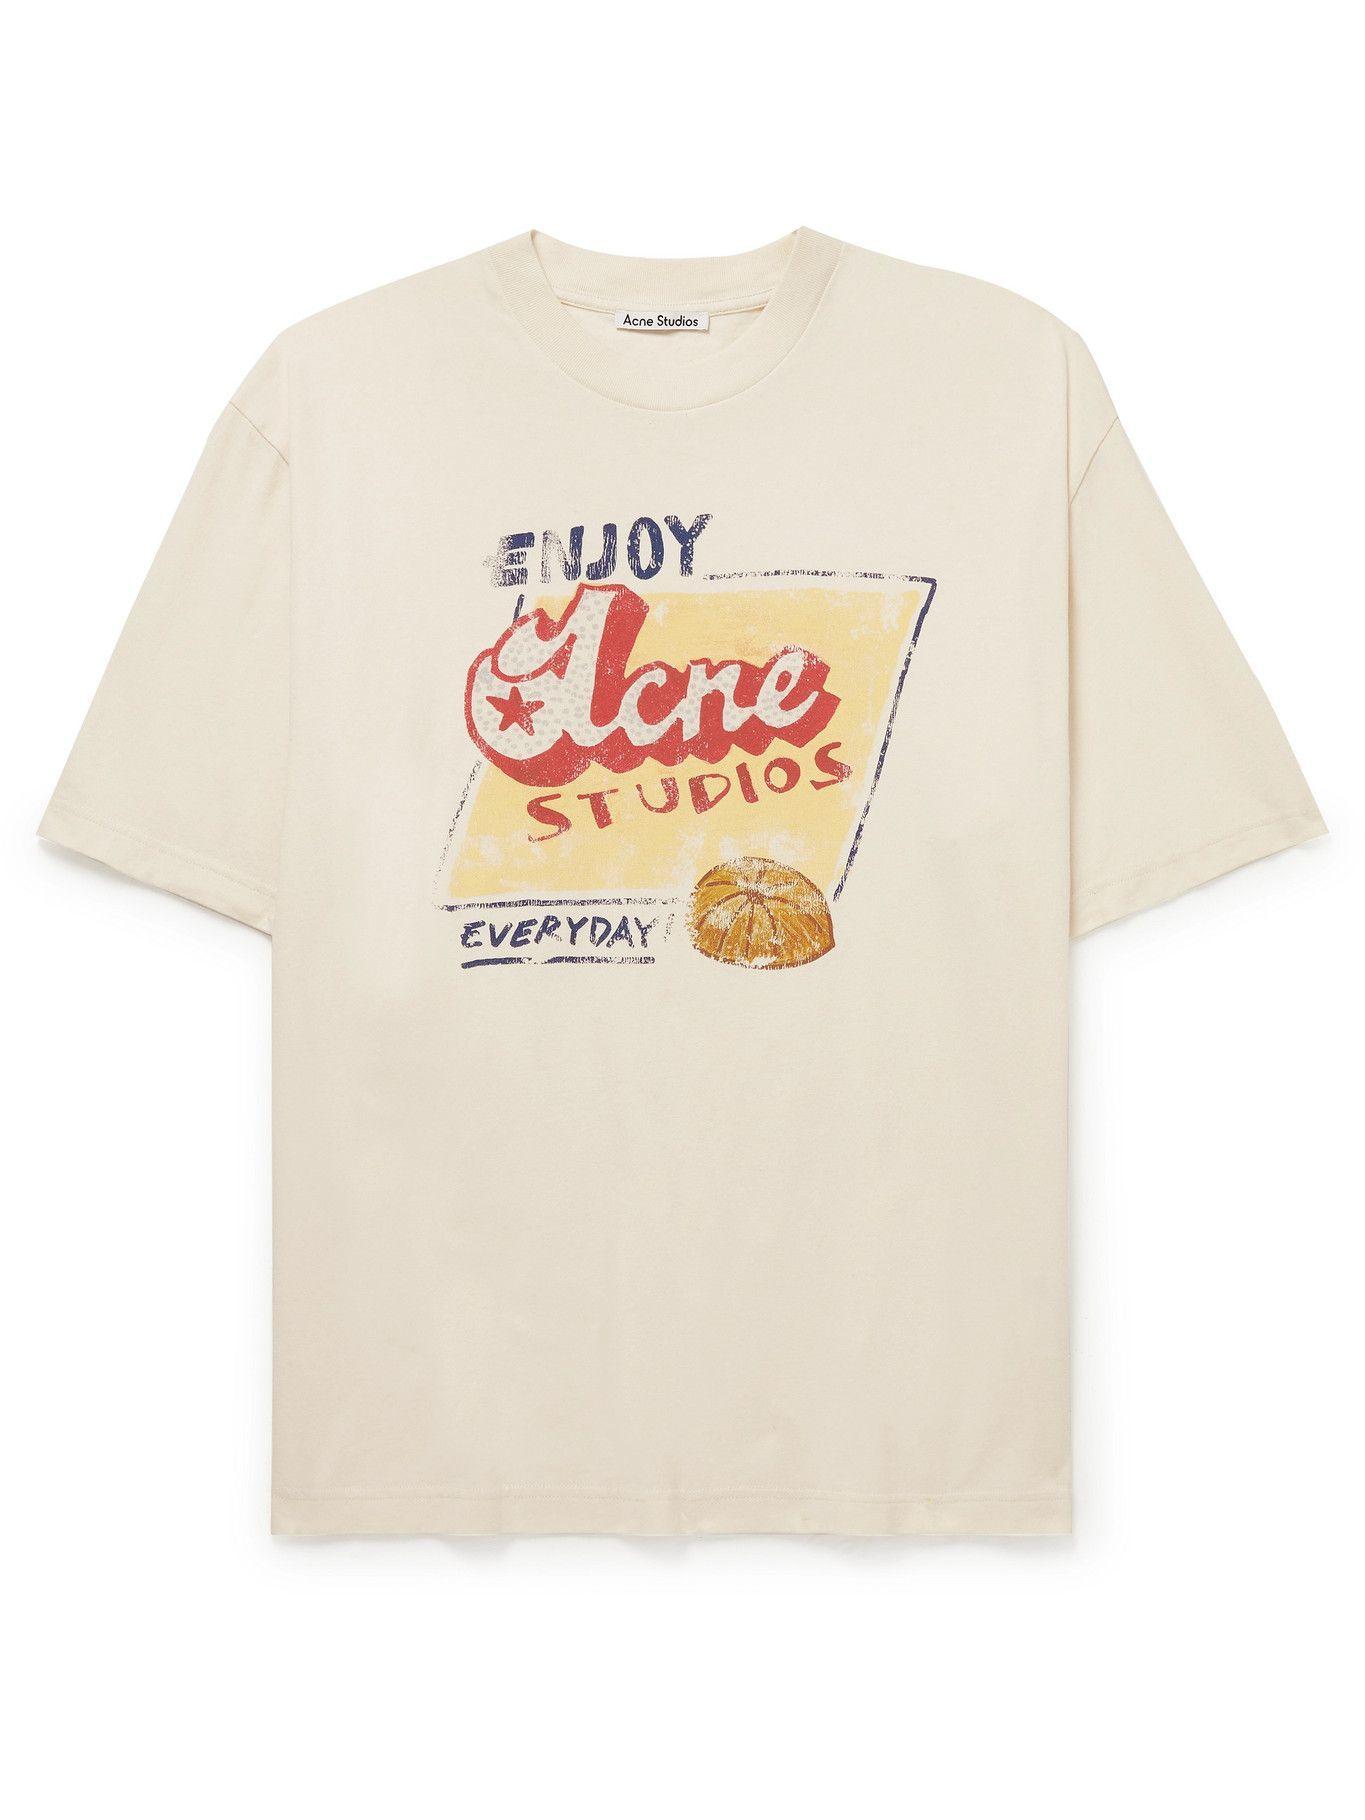 Photo: Acne Studios - Grant Levy Oversized Logo-Print Cotton-Jersey T-Shirt - Neutrals